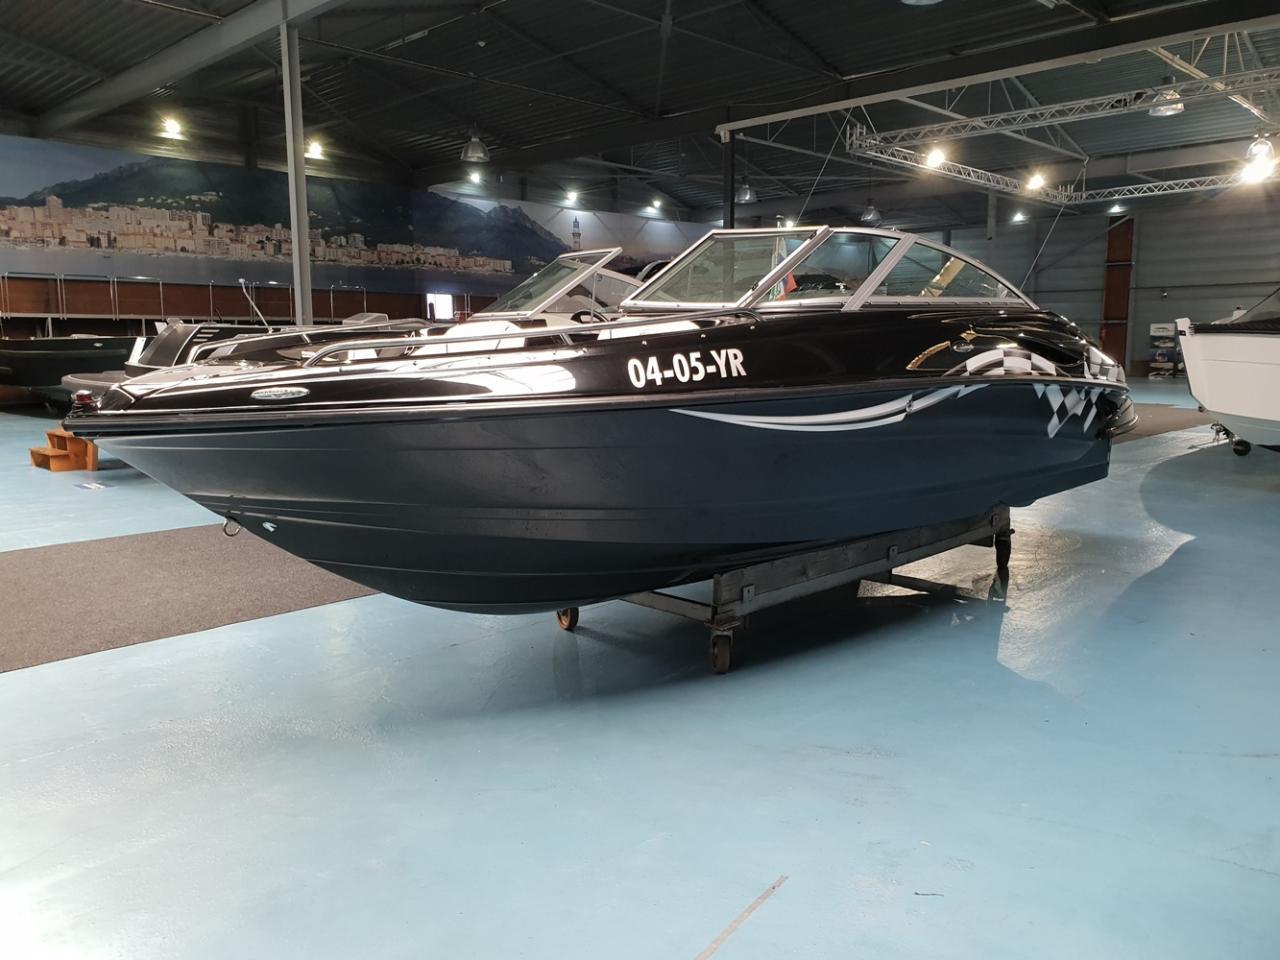 Crownline 220 met Mercruiser 5 liter V8 260 pk 1